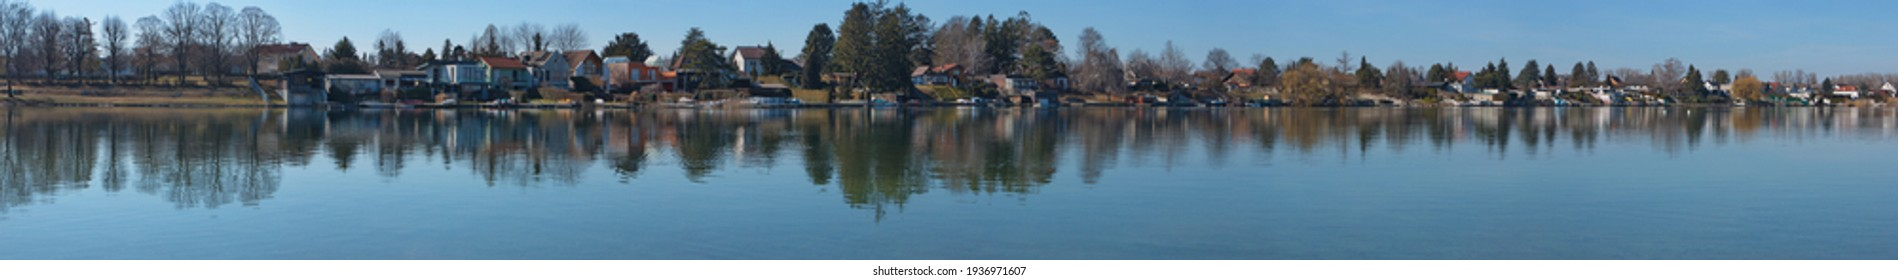 Panoramic view of Neufelder Lake in Neufeld an der Leitha, Burgenland, Austria, Europe  - Shutterstock ID 1936971607